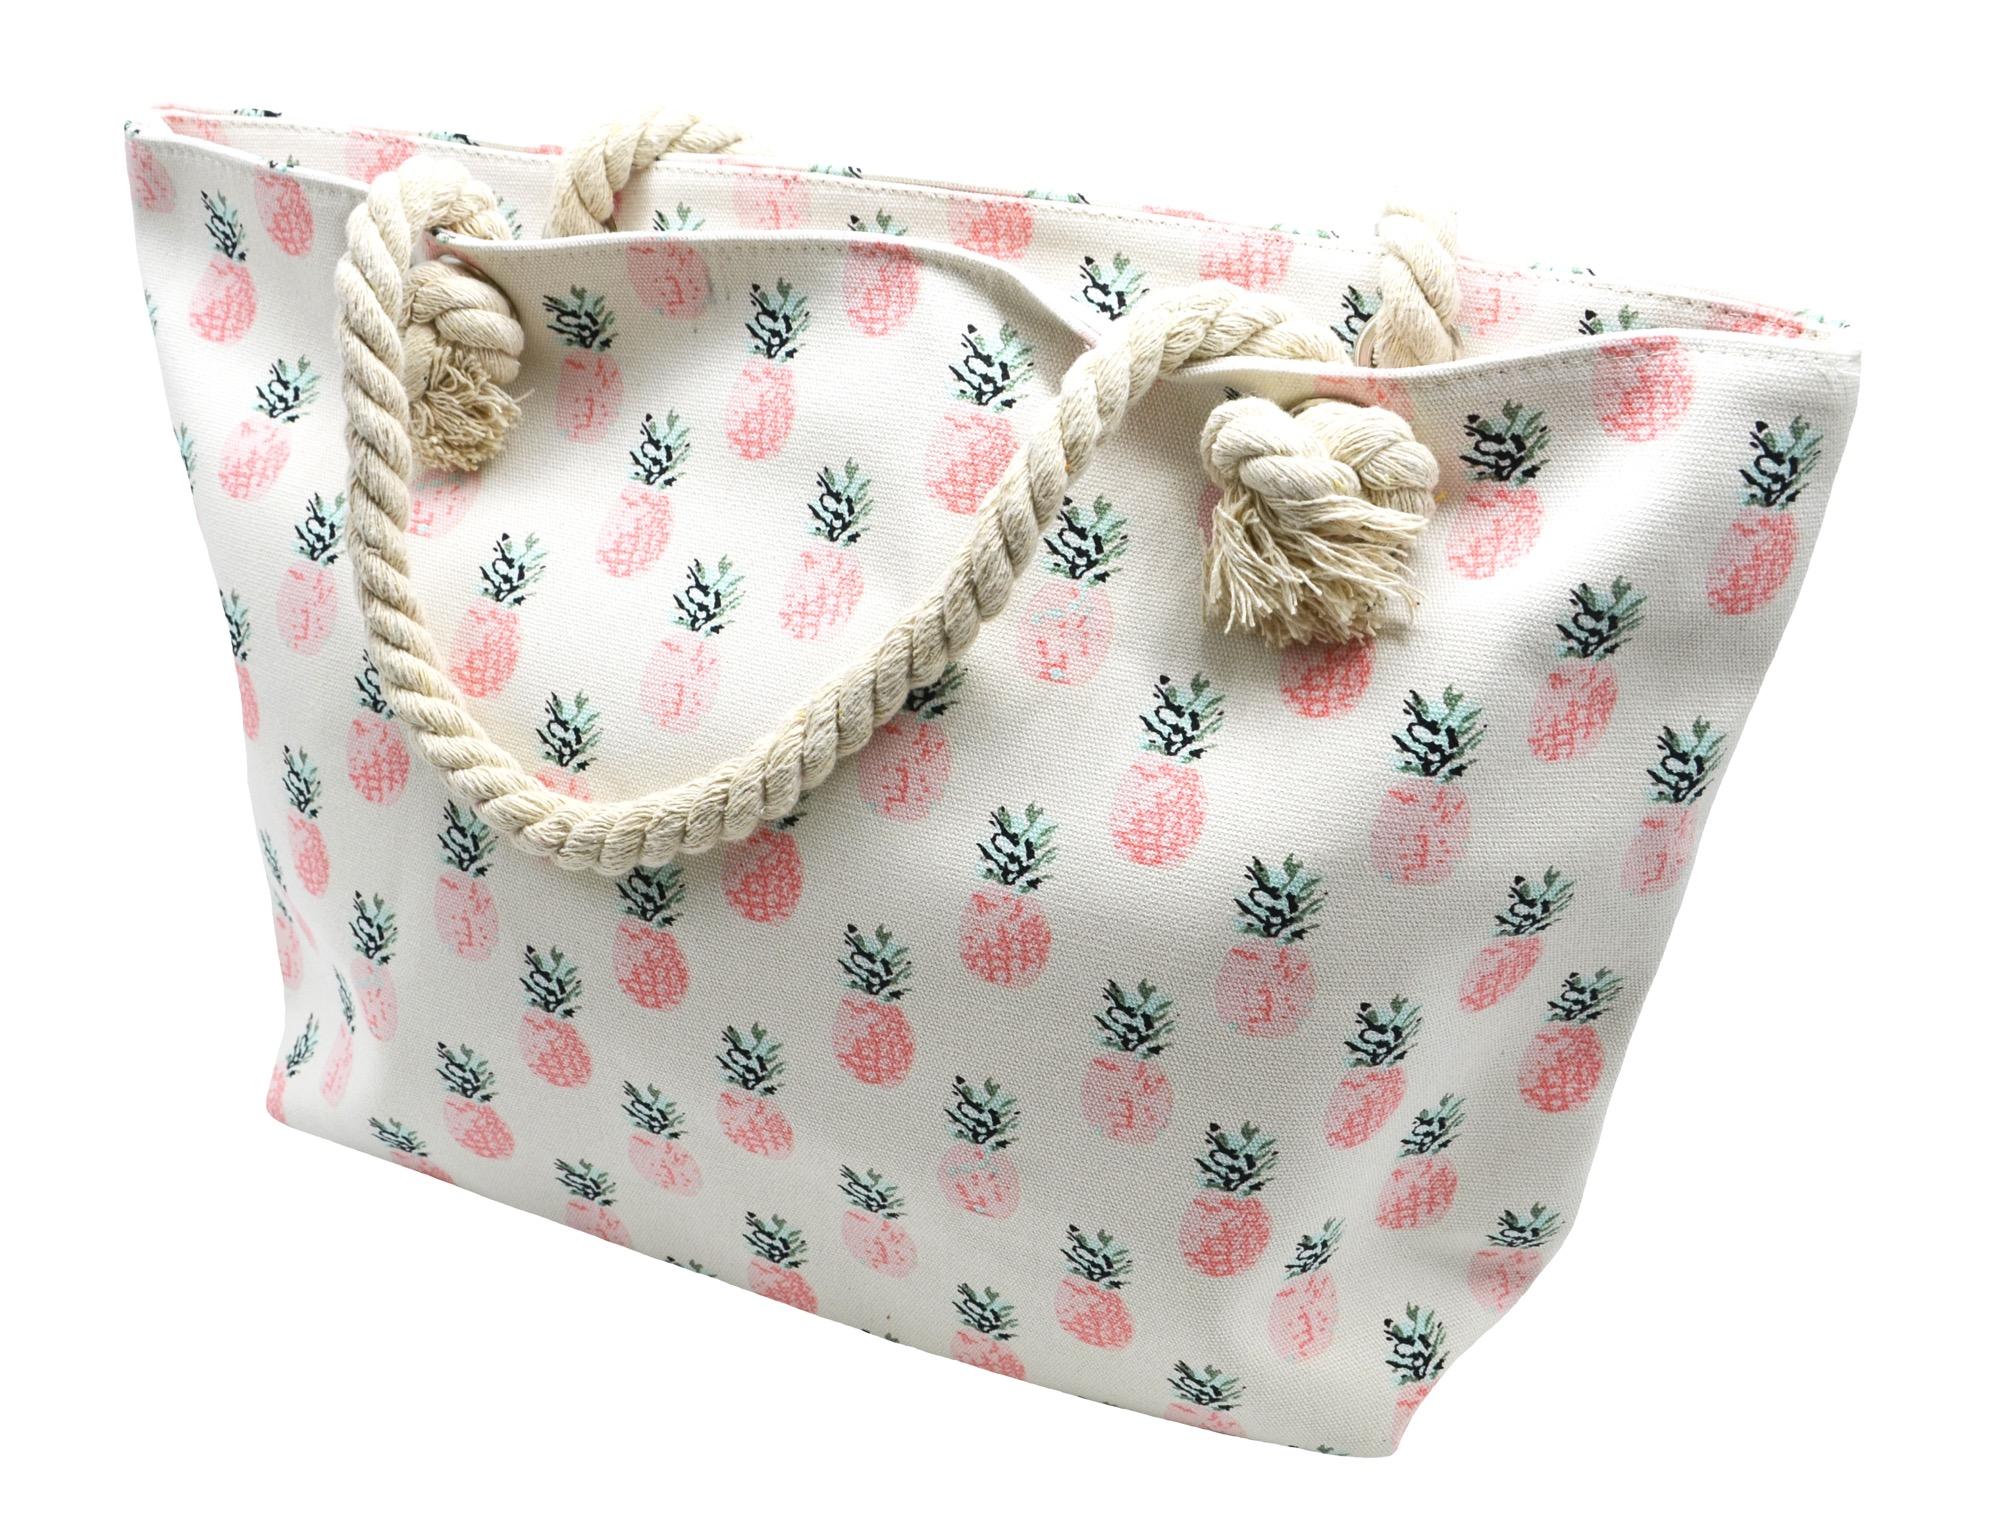 atb08 grand sac cabas de plage avec imprim ananas rose et anses corde torsad e oh my shop. Black Bedroom Furniture Sets. Home Design Ideas